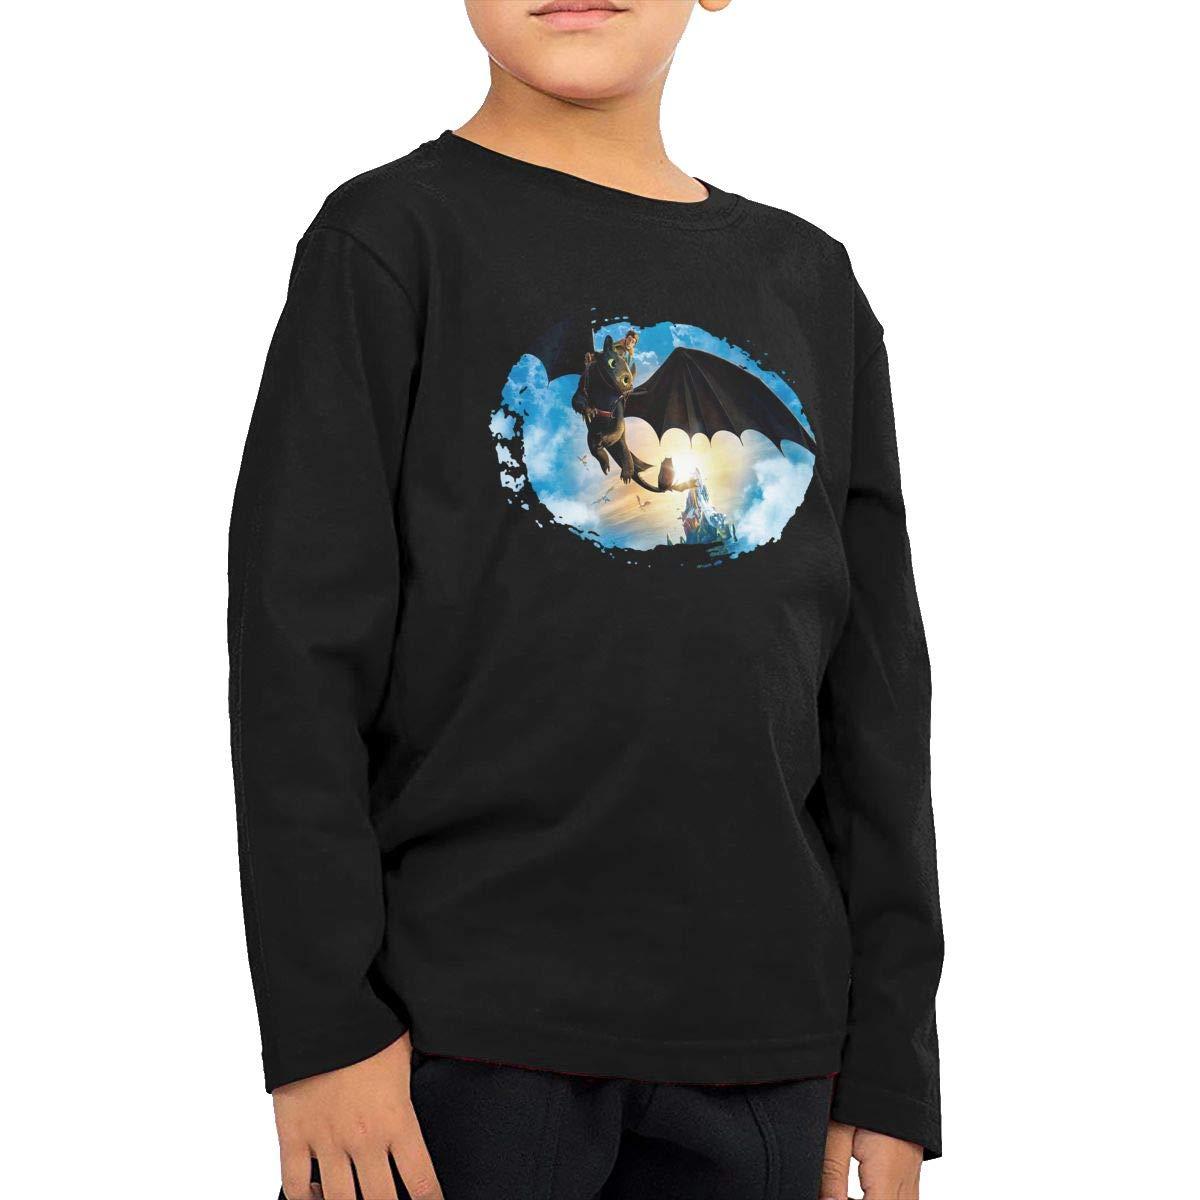 Wwdcd Cool Shirt 3791